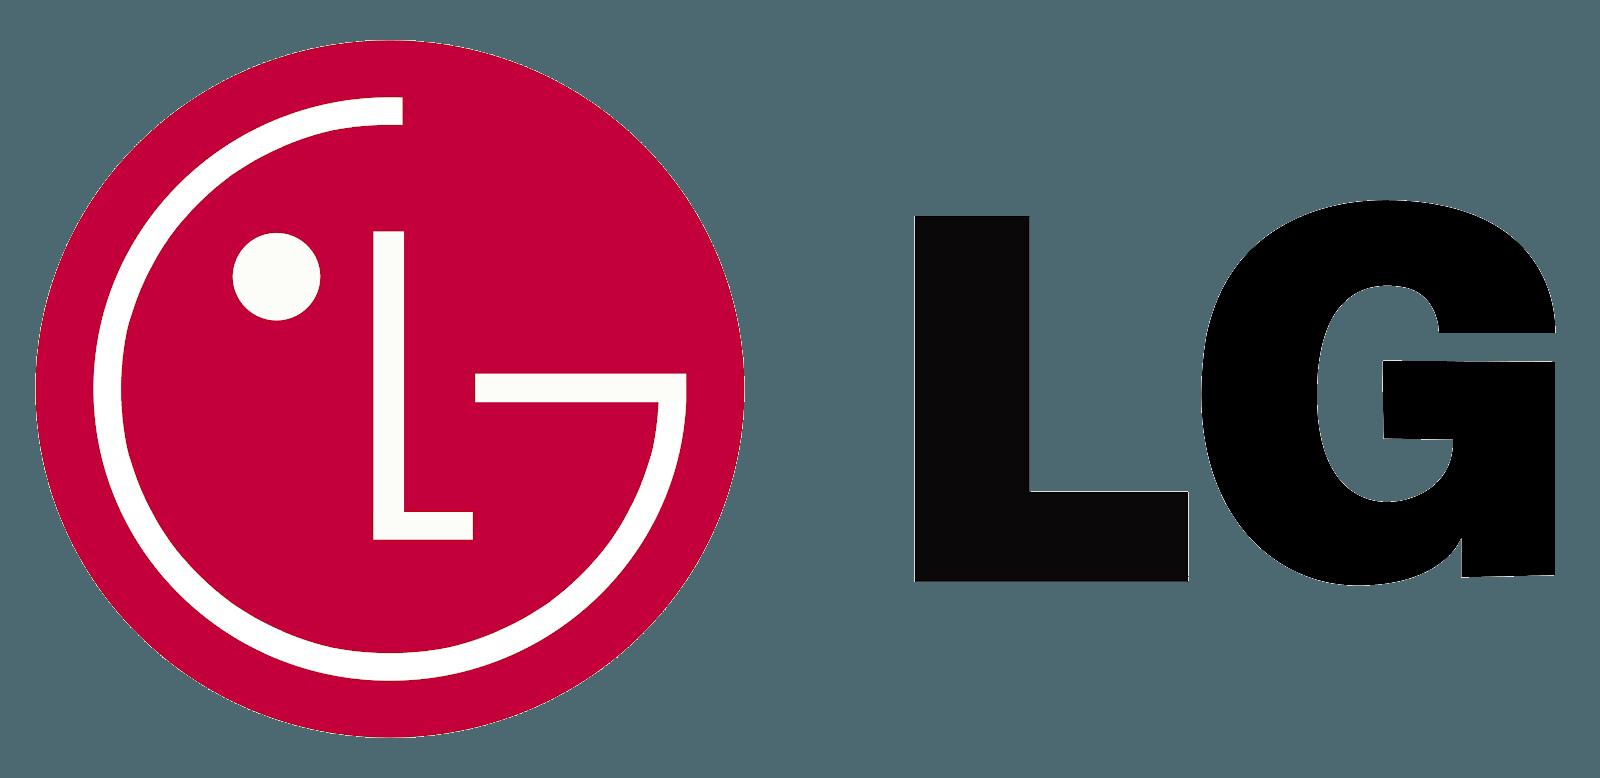 LG ofertas